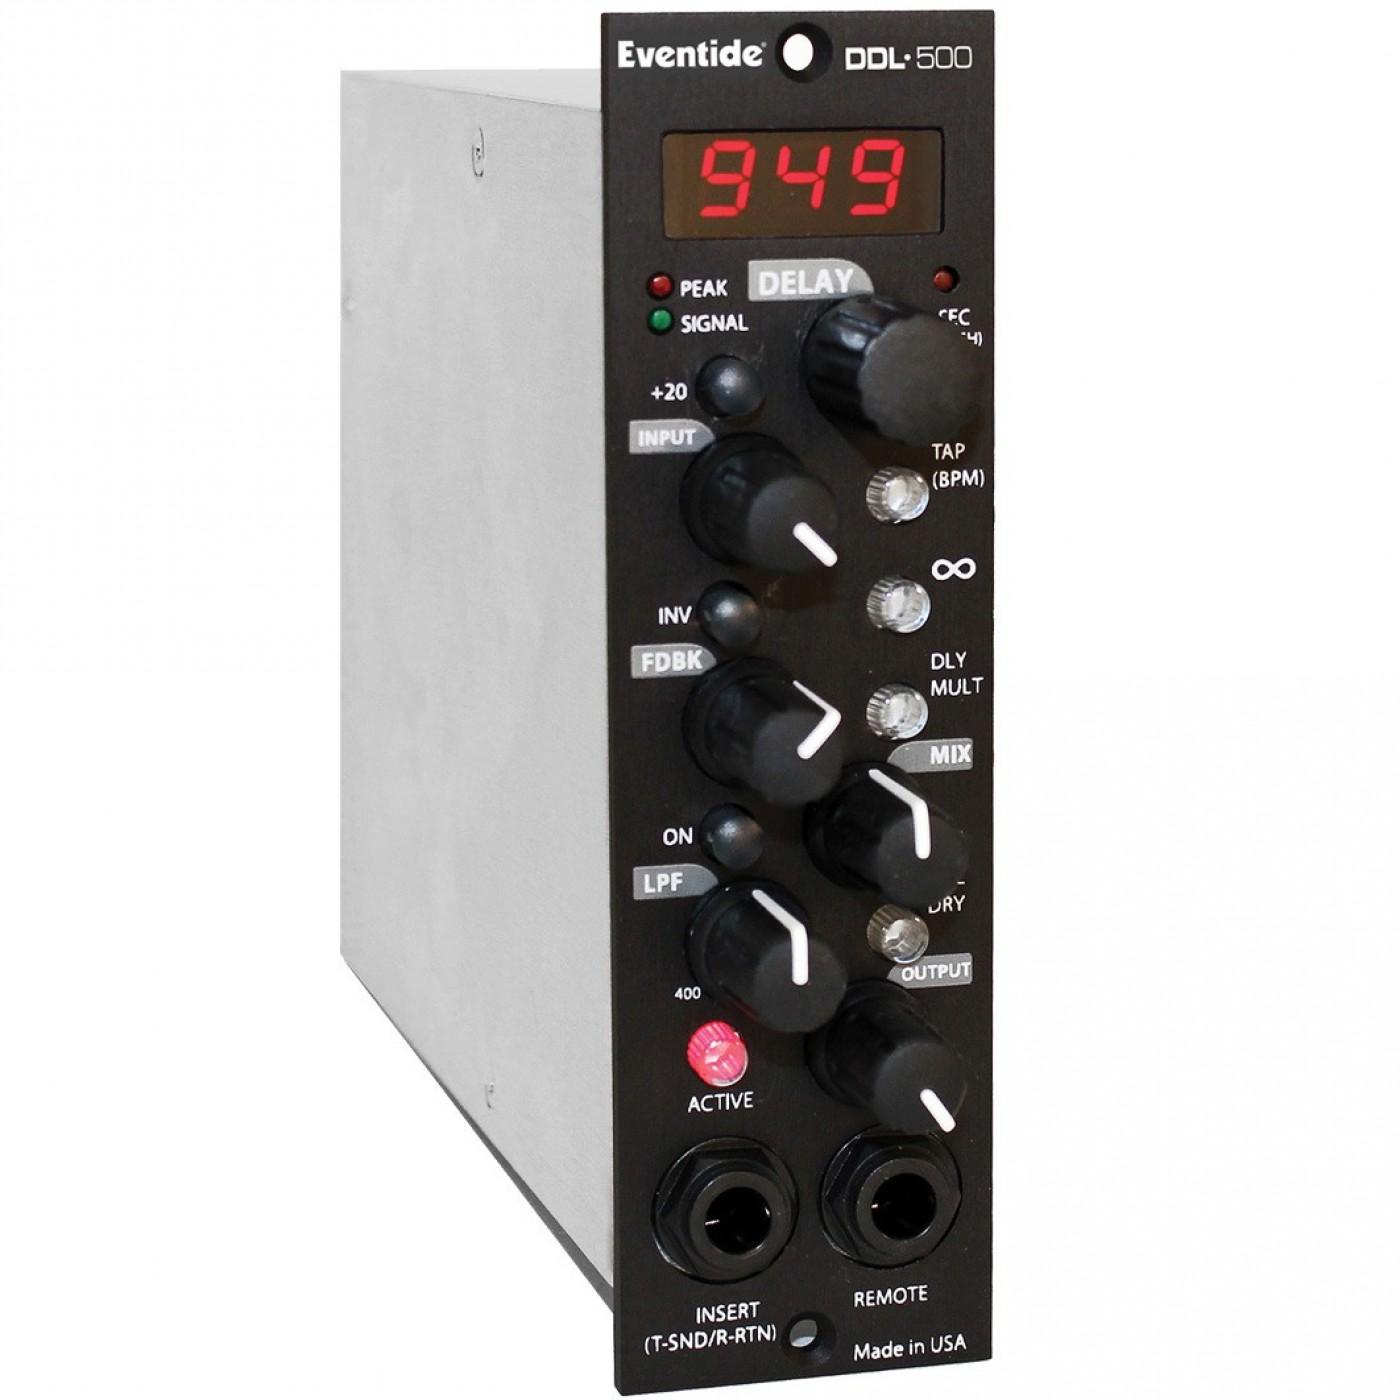 Eventide DDL-500 | Rage Audio